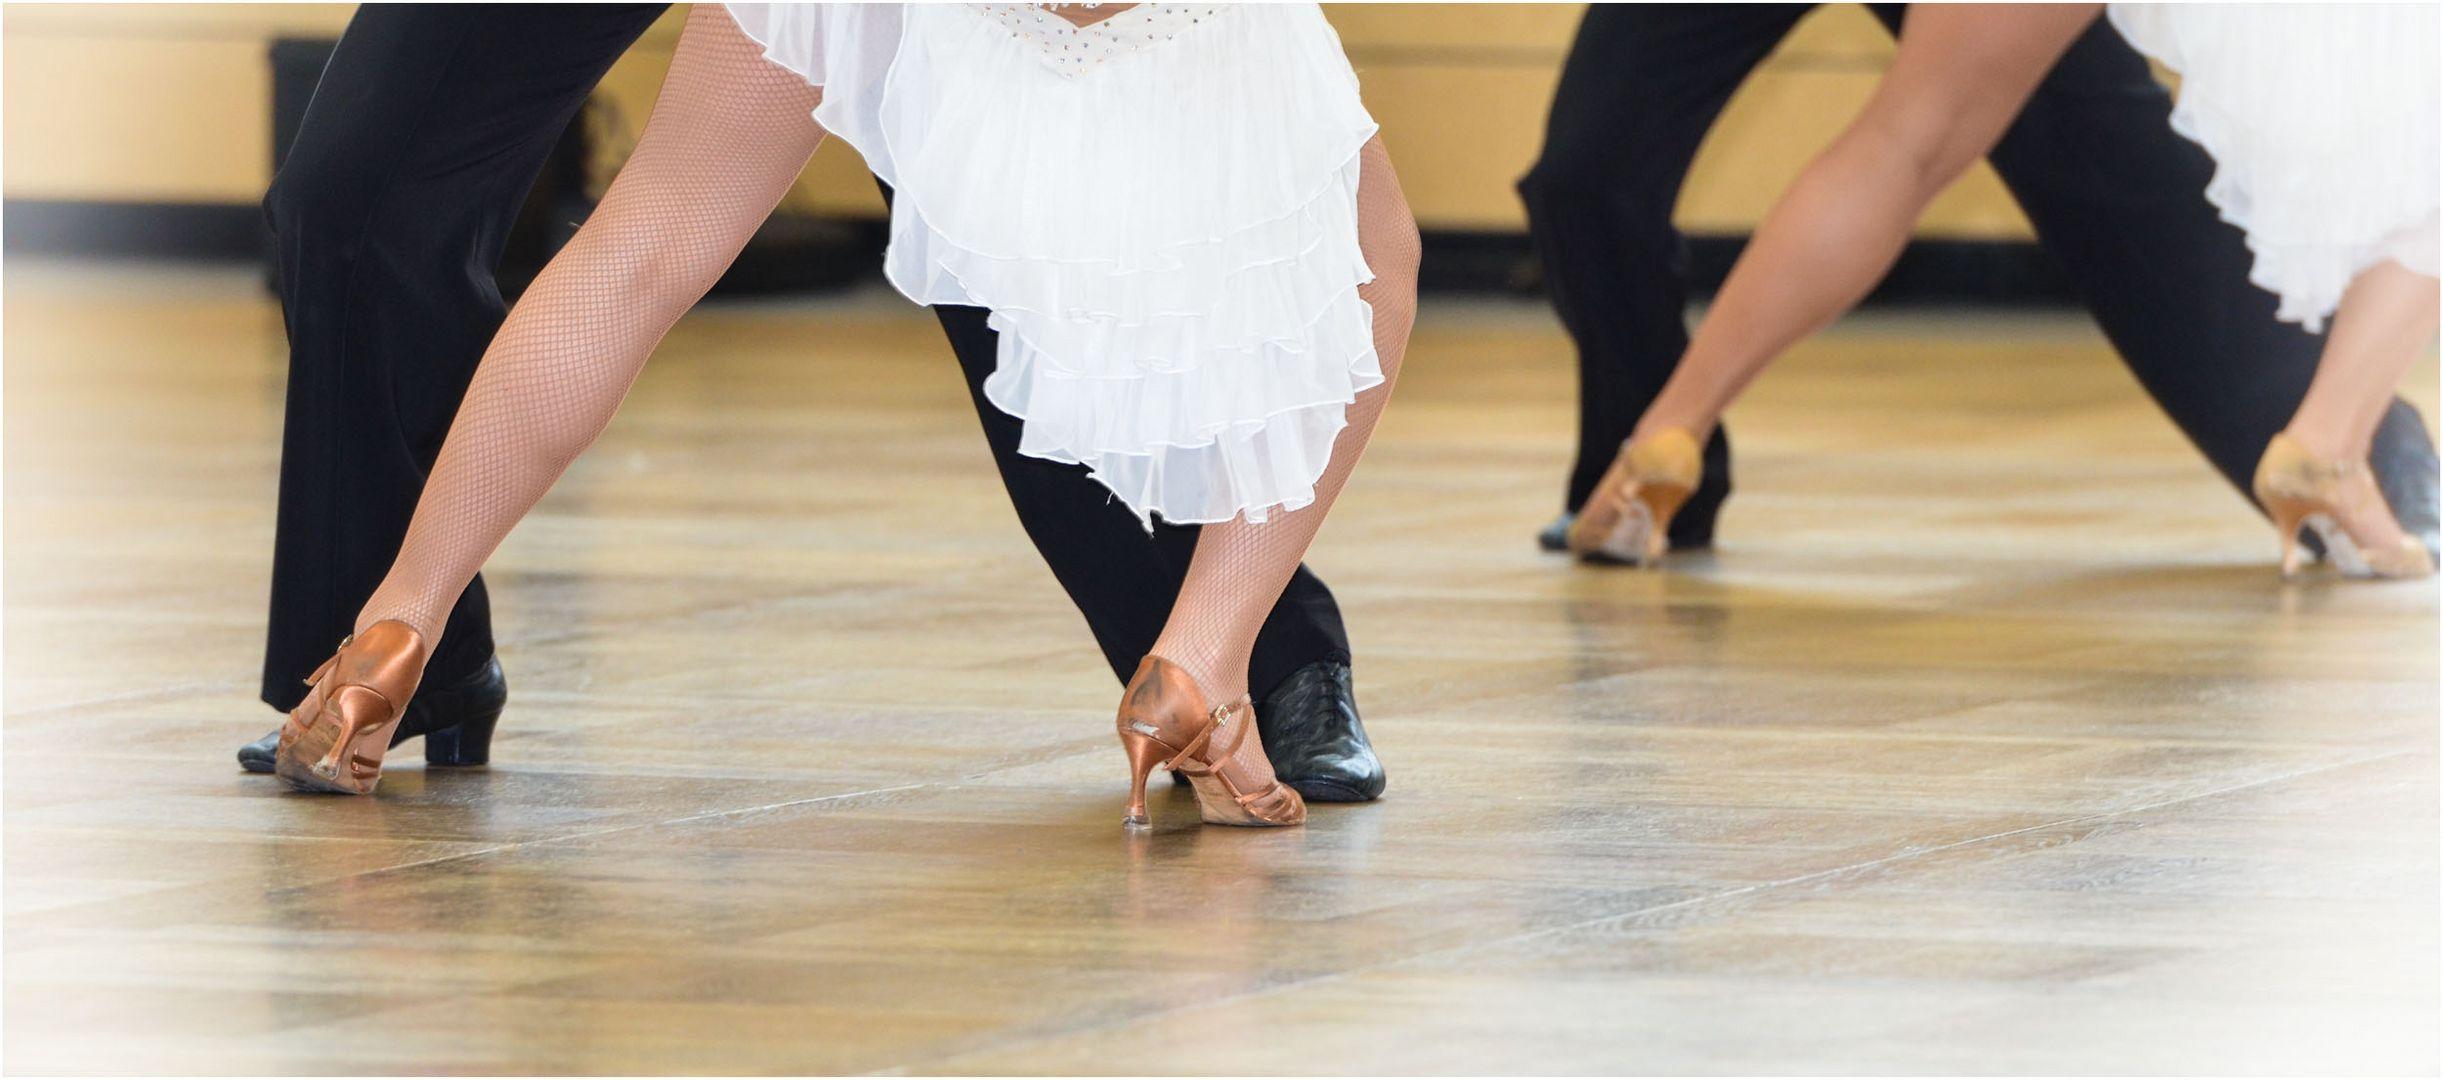 Let us dance tonight... Nr. 1